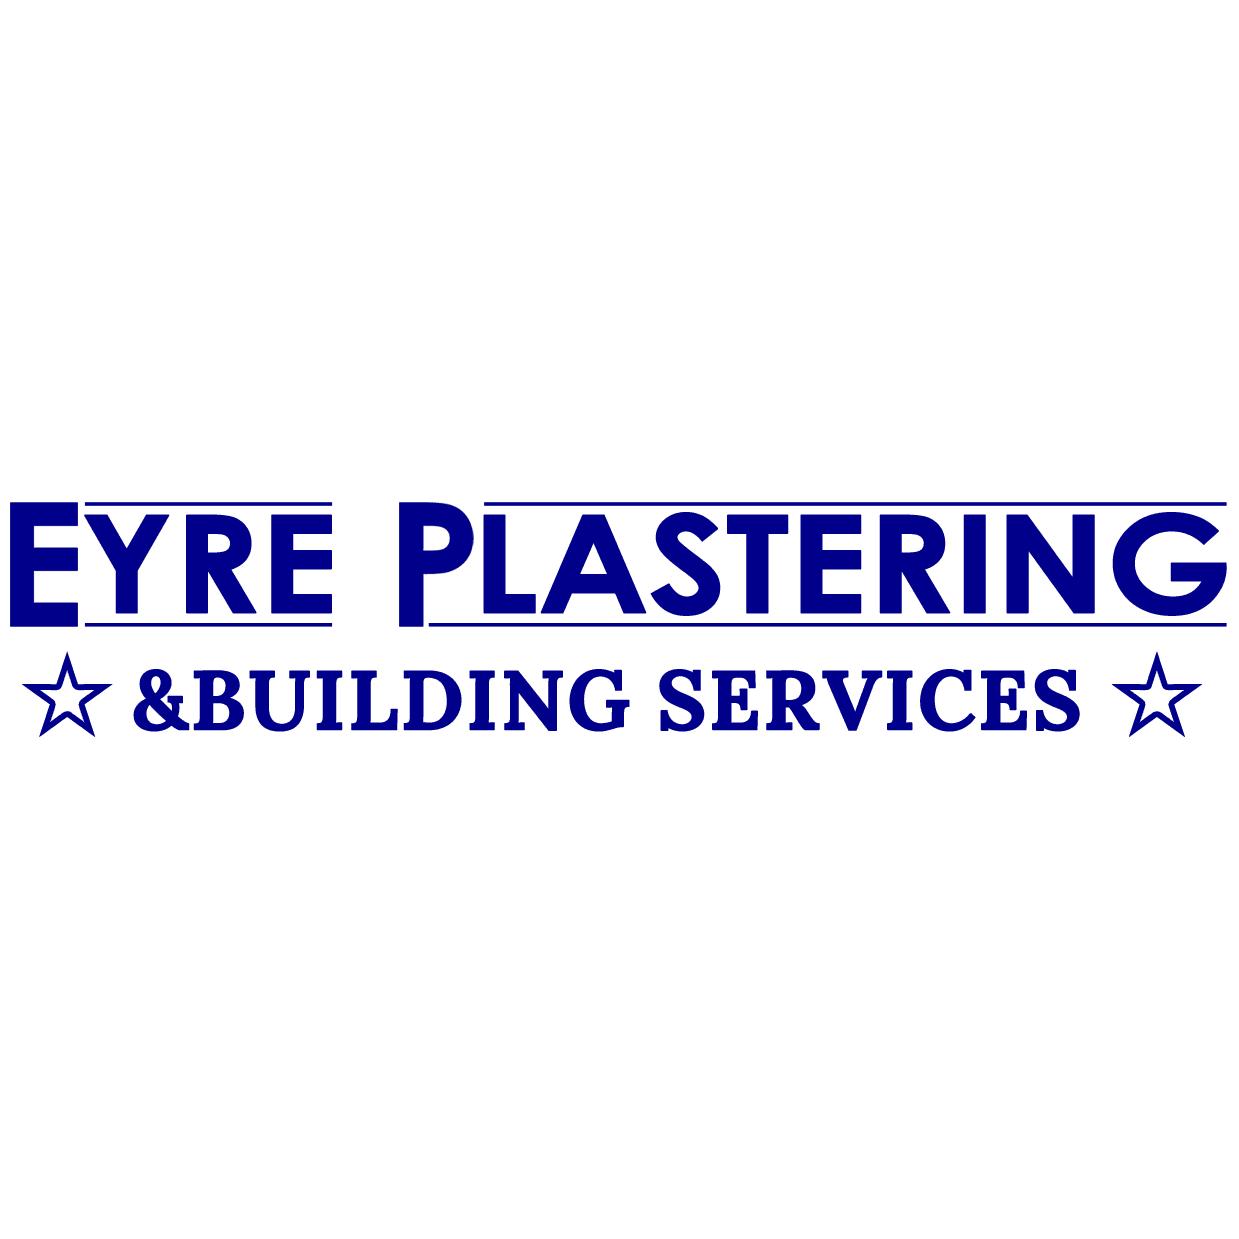 Eyre Plastering